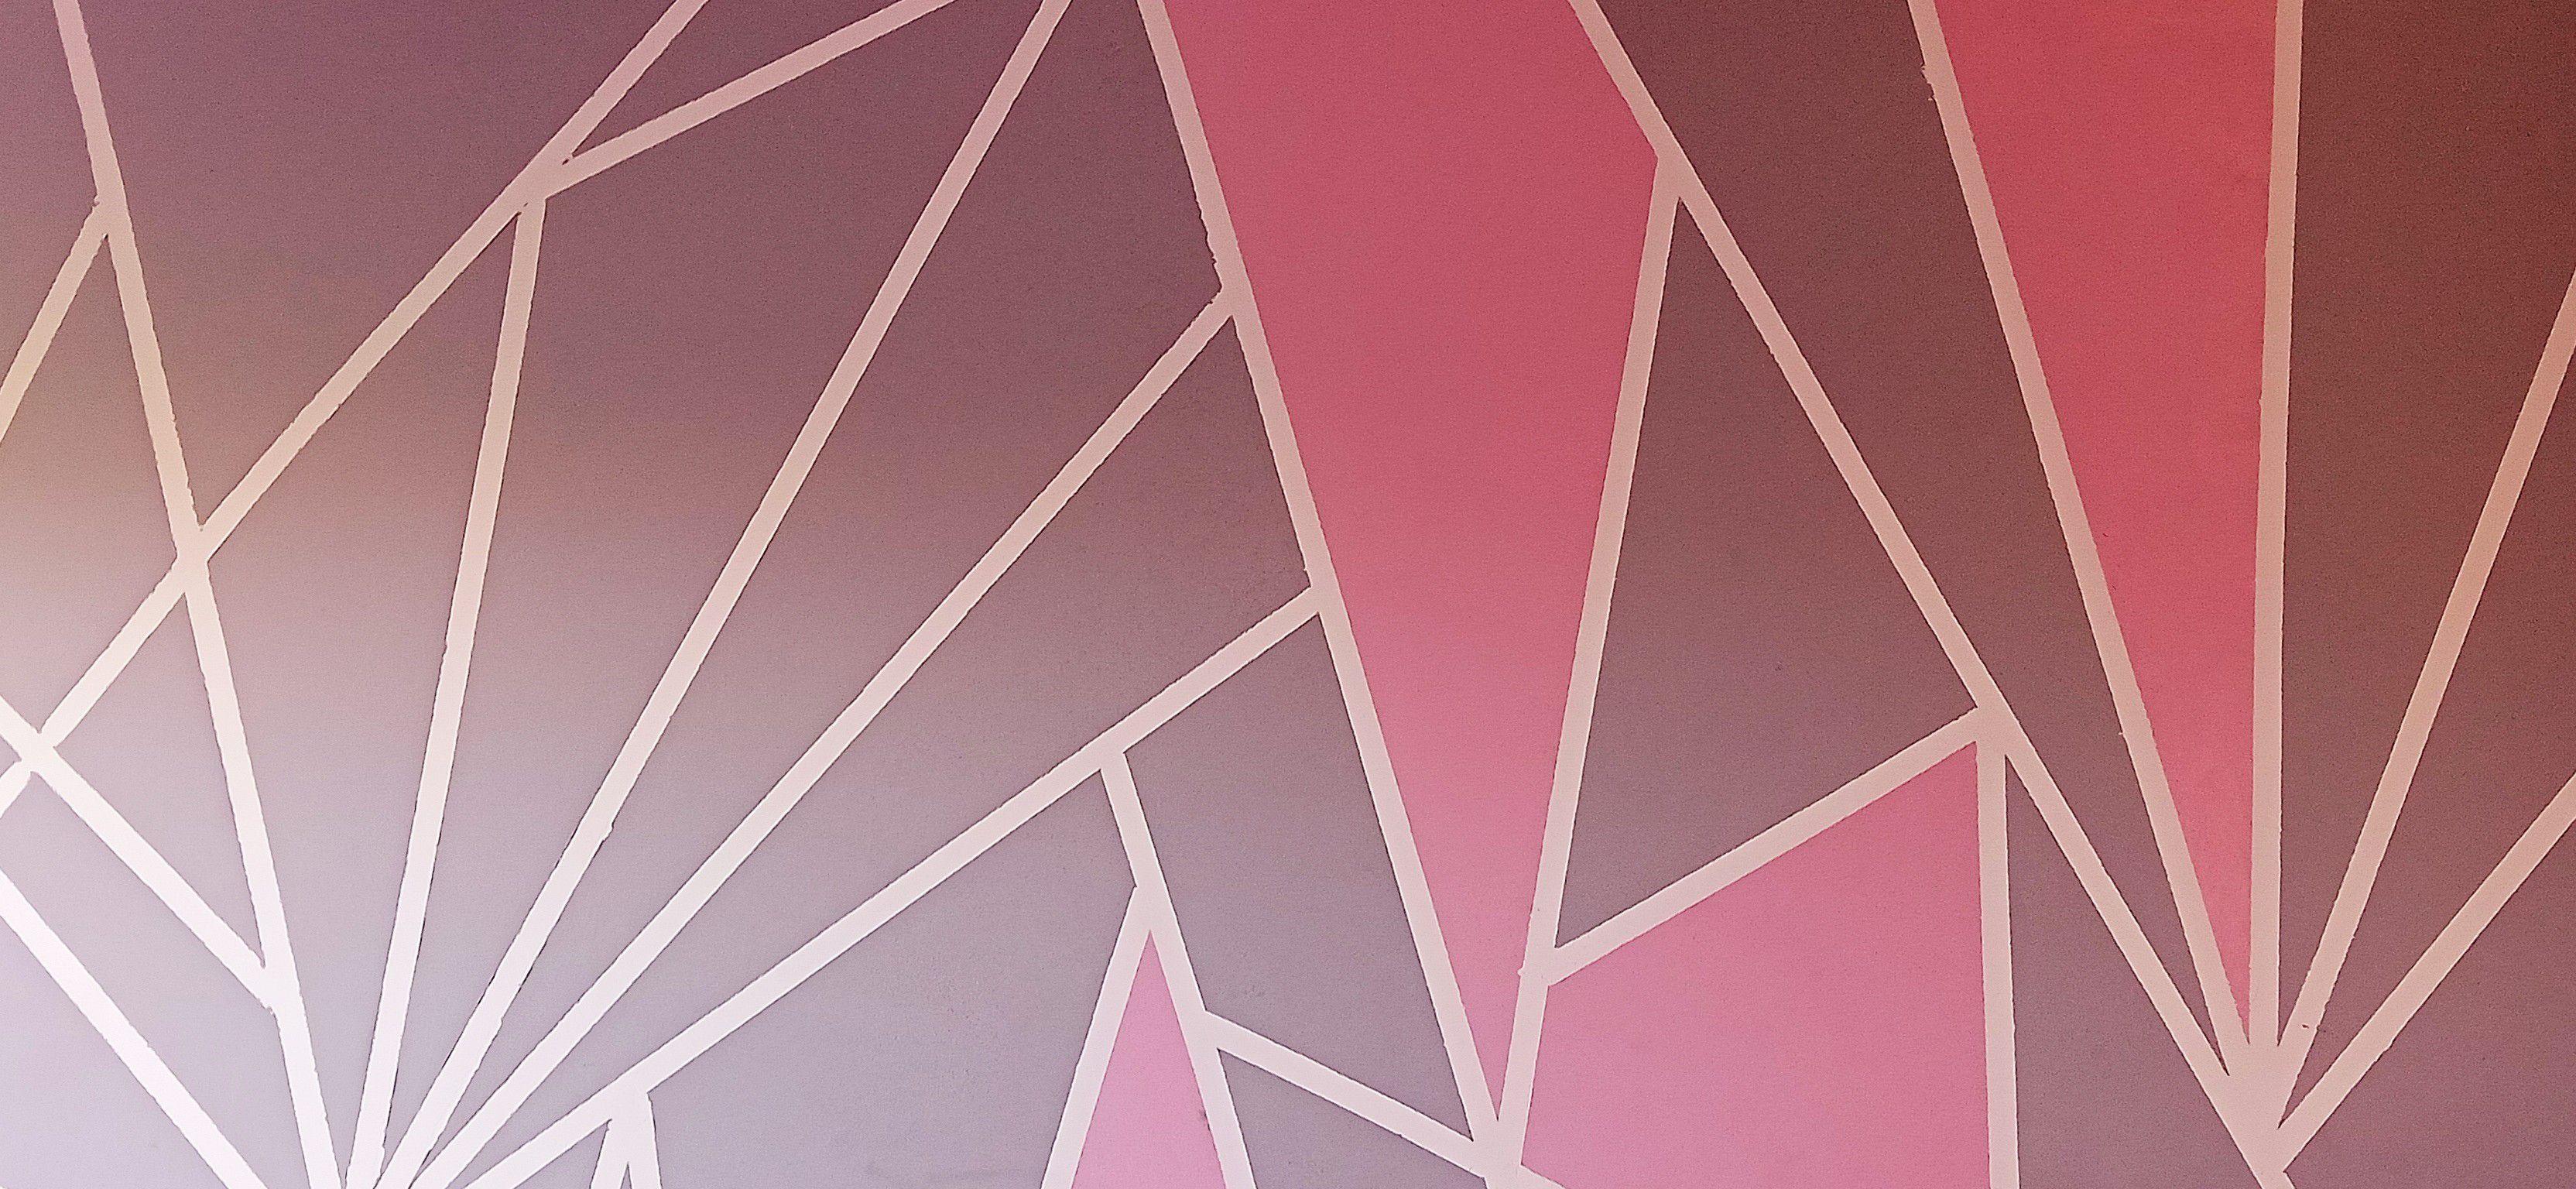 pinturas figuras geométricas